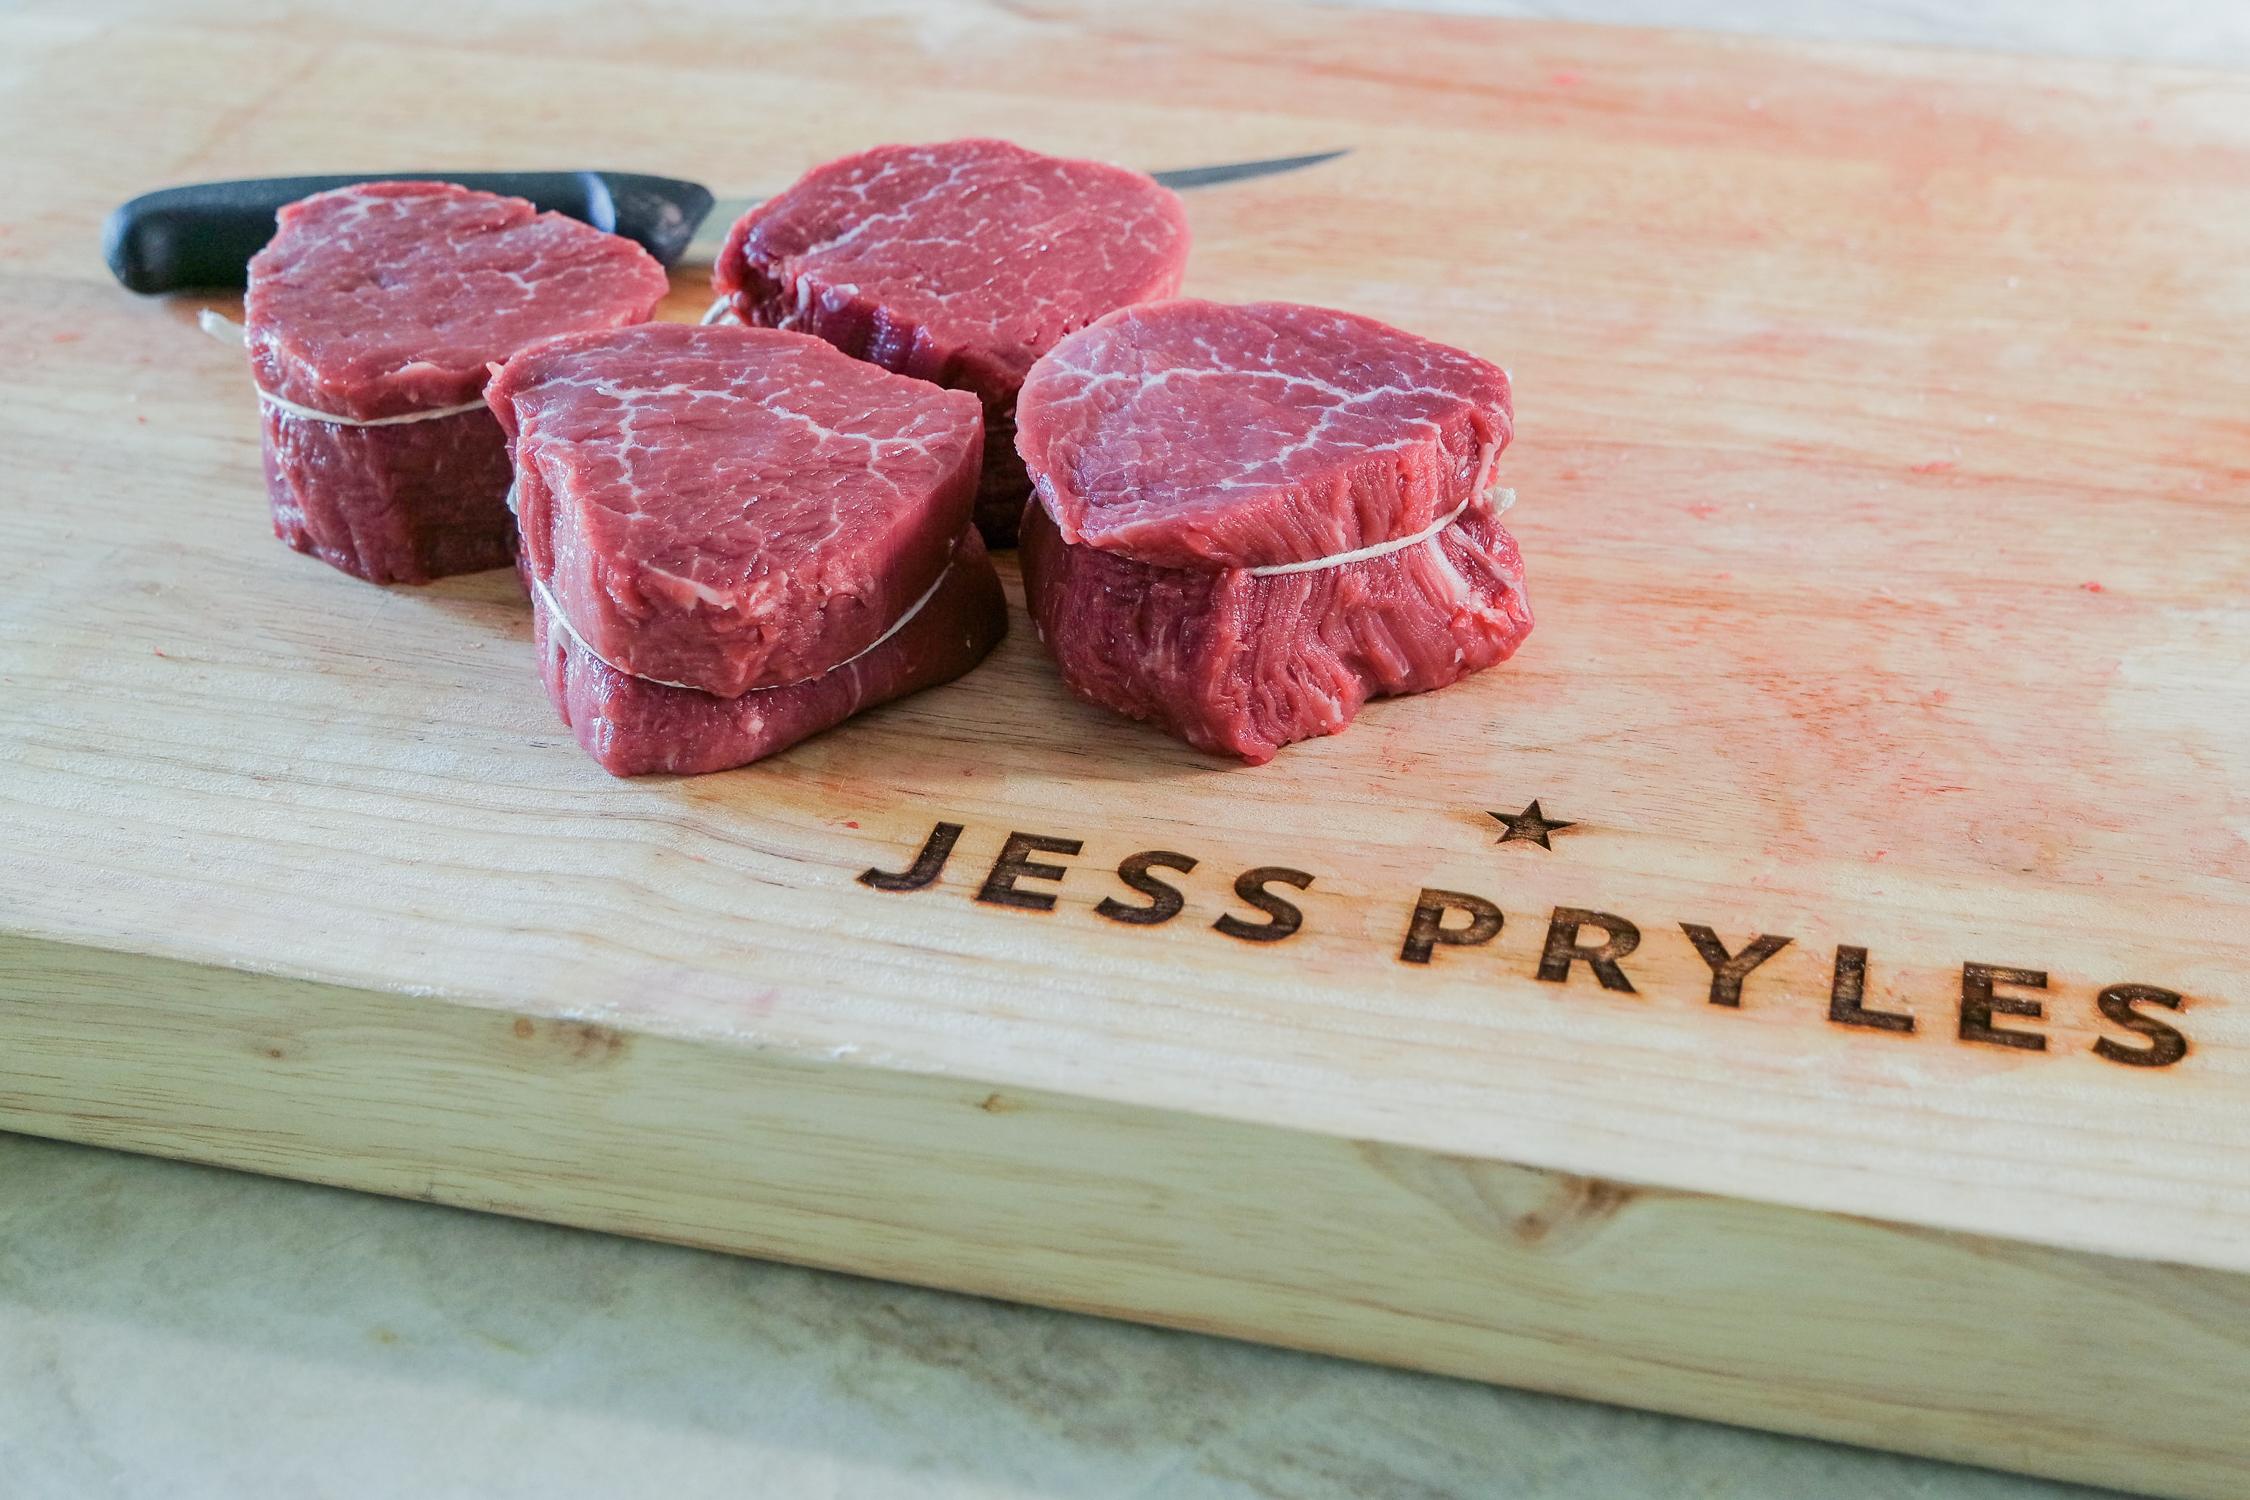 tied filet mignon steaks